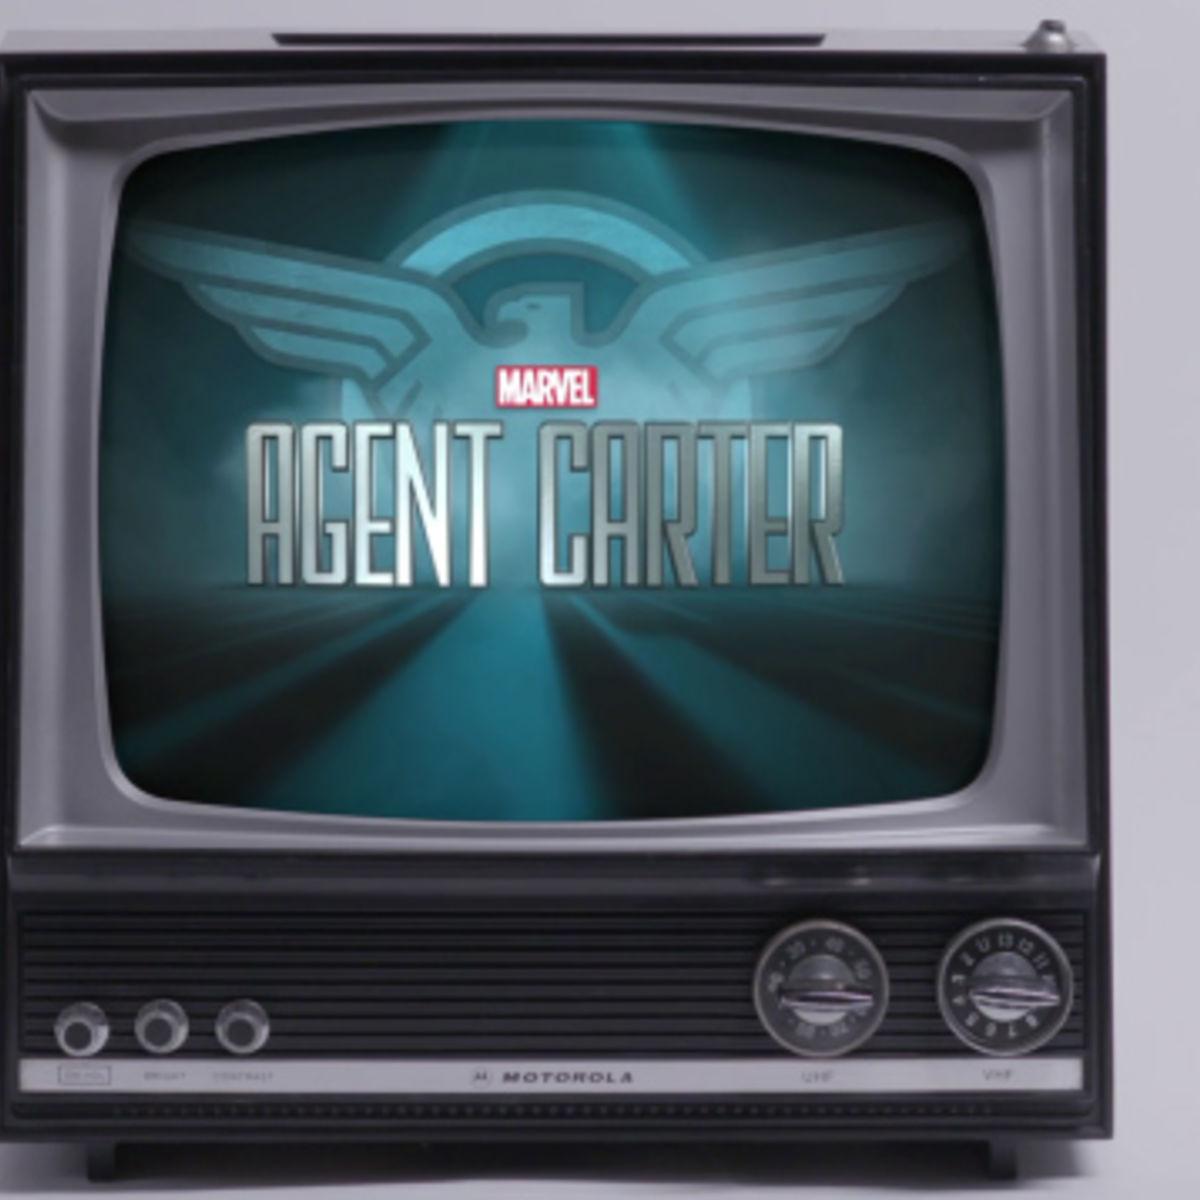 agentcarter_see_0.jpg